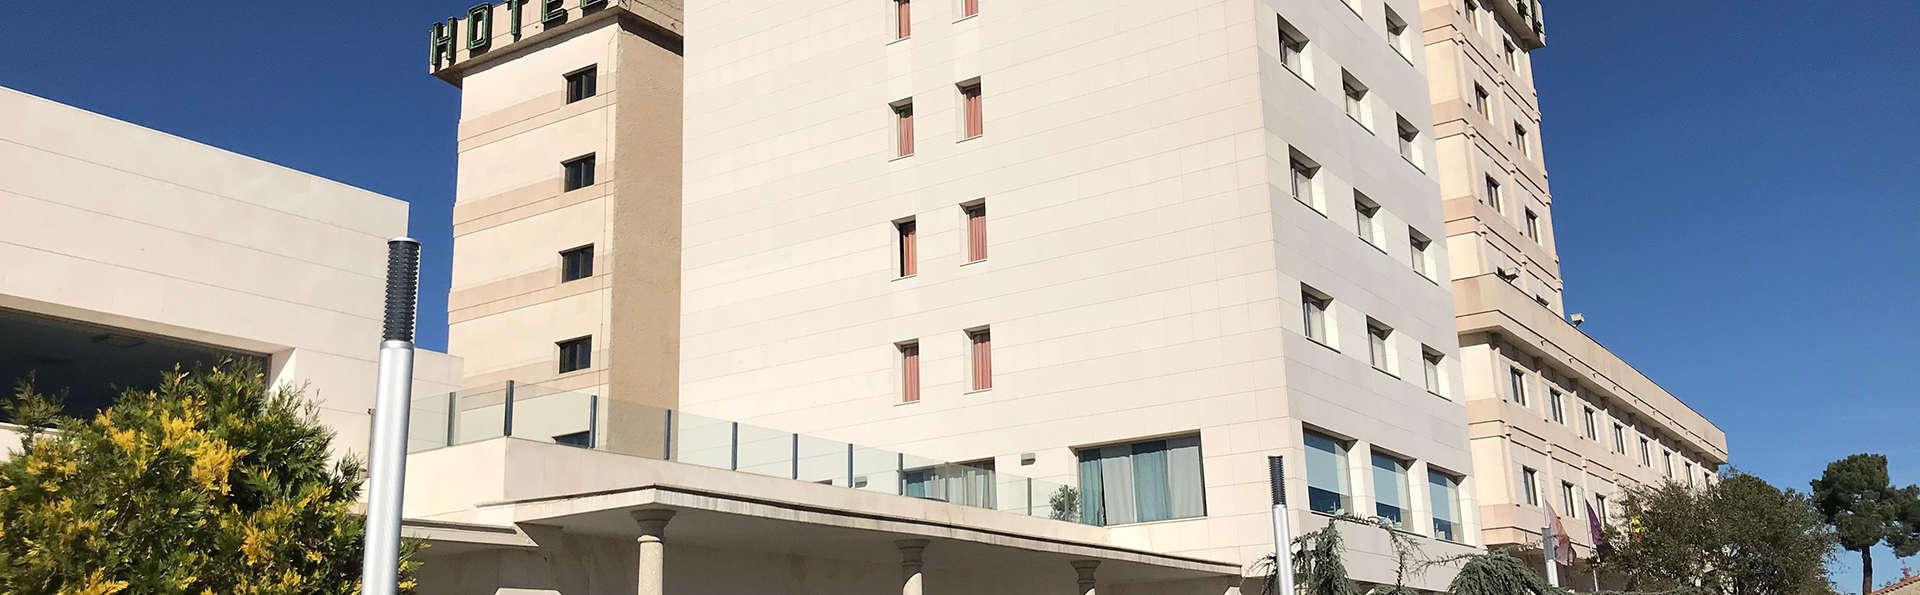 Sercotel Hotel Cuatro Postes - EDIT_NEW_front.jpg